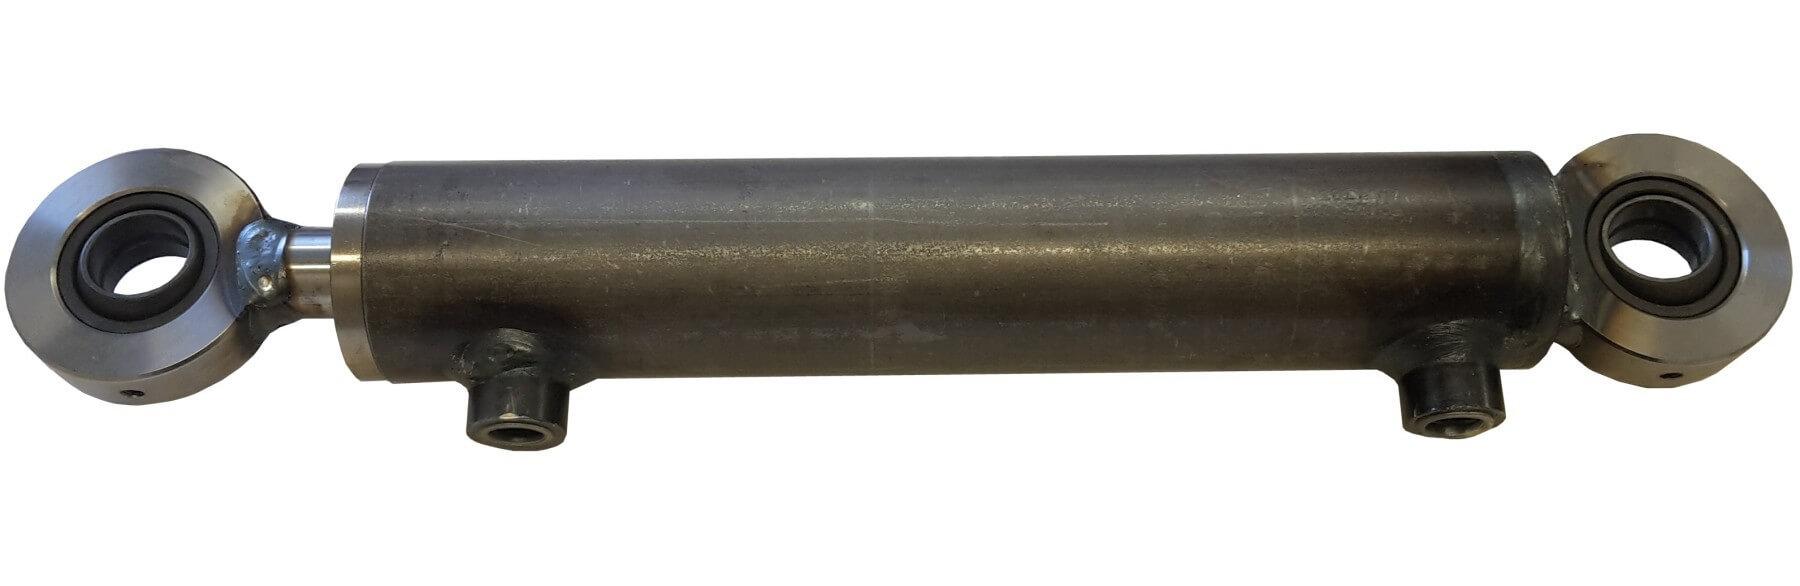 Hydraulisylinteri CL 50. 30. 450 GE